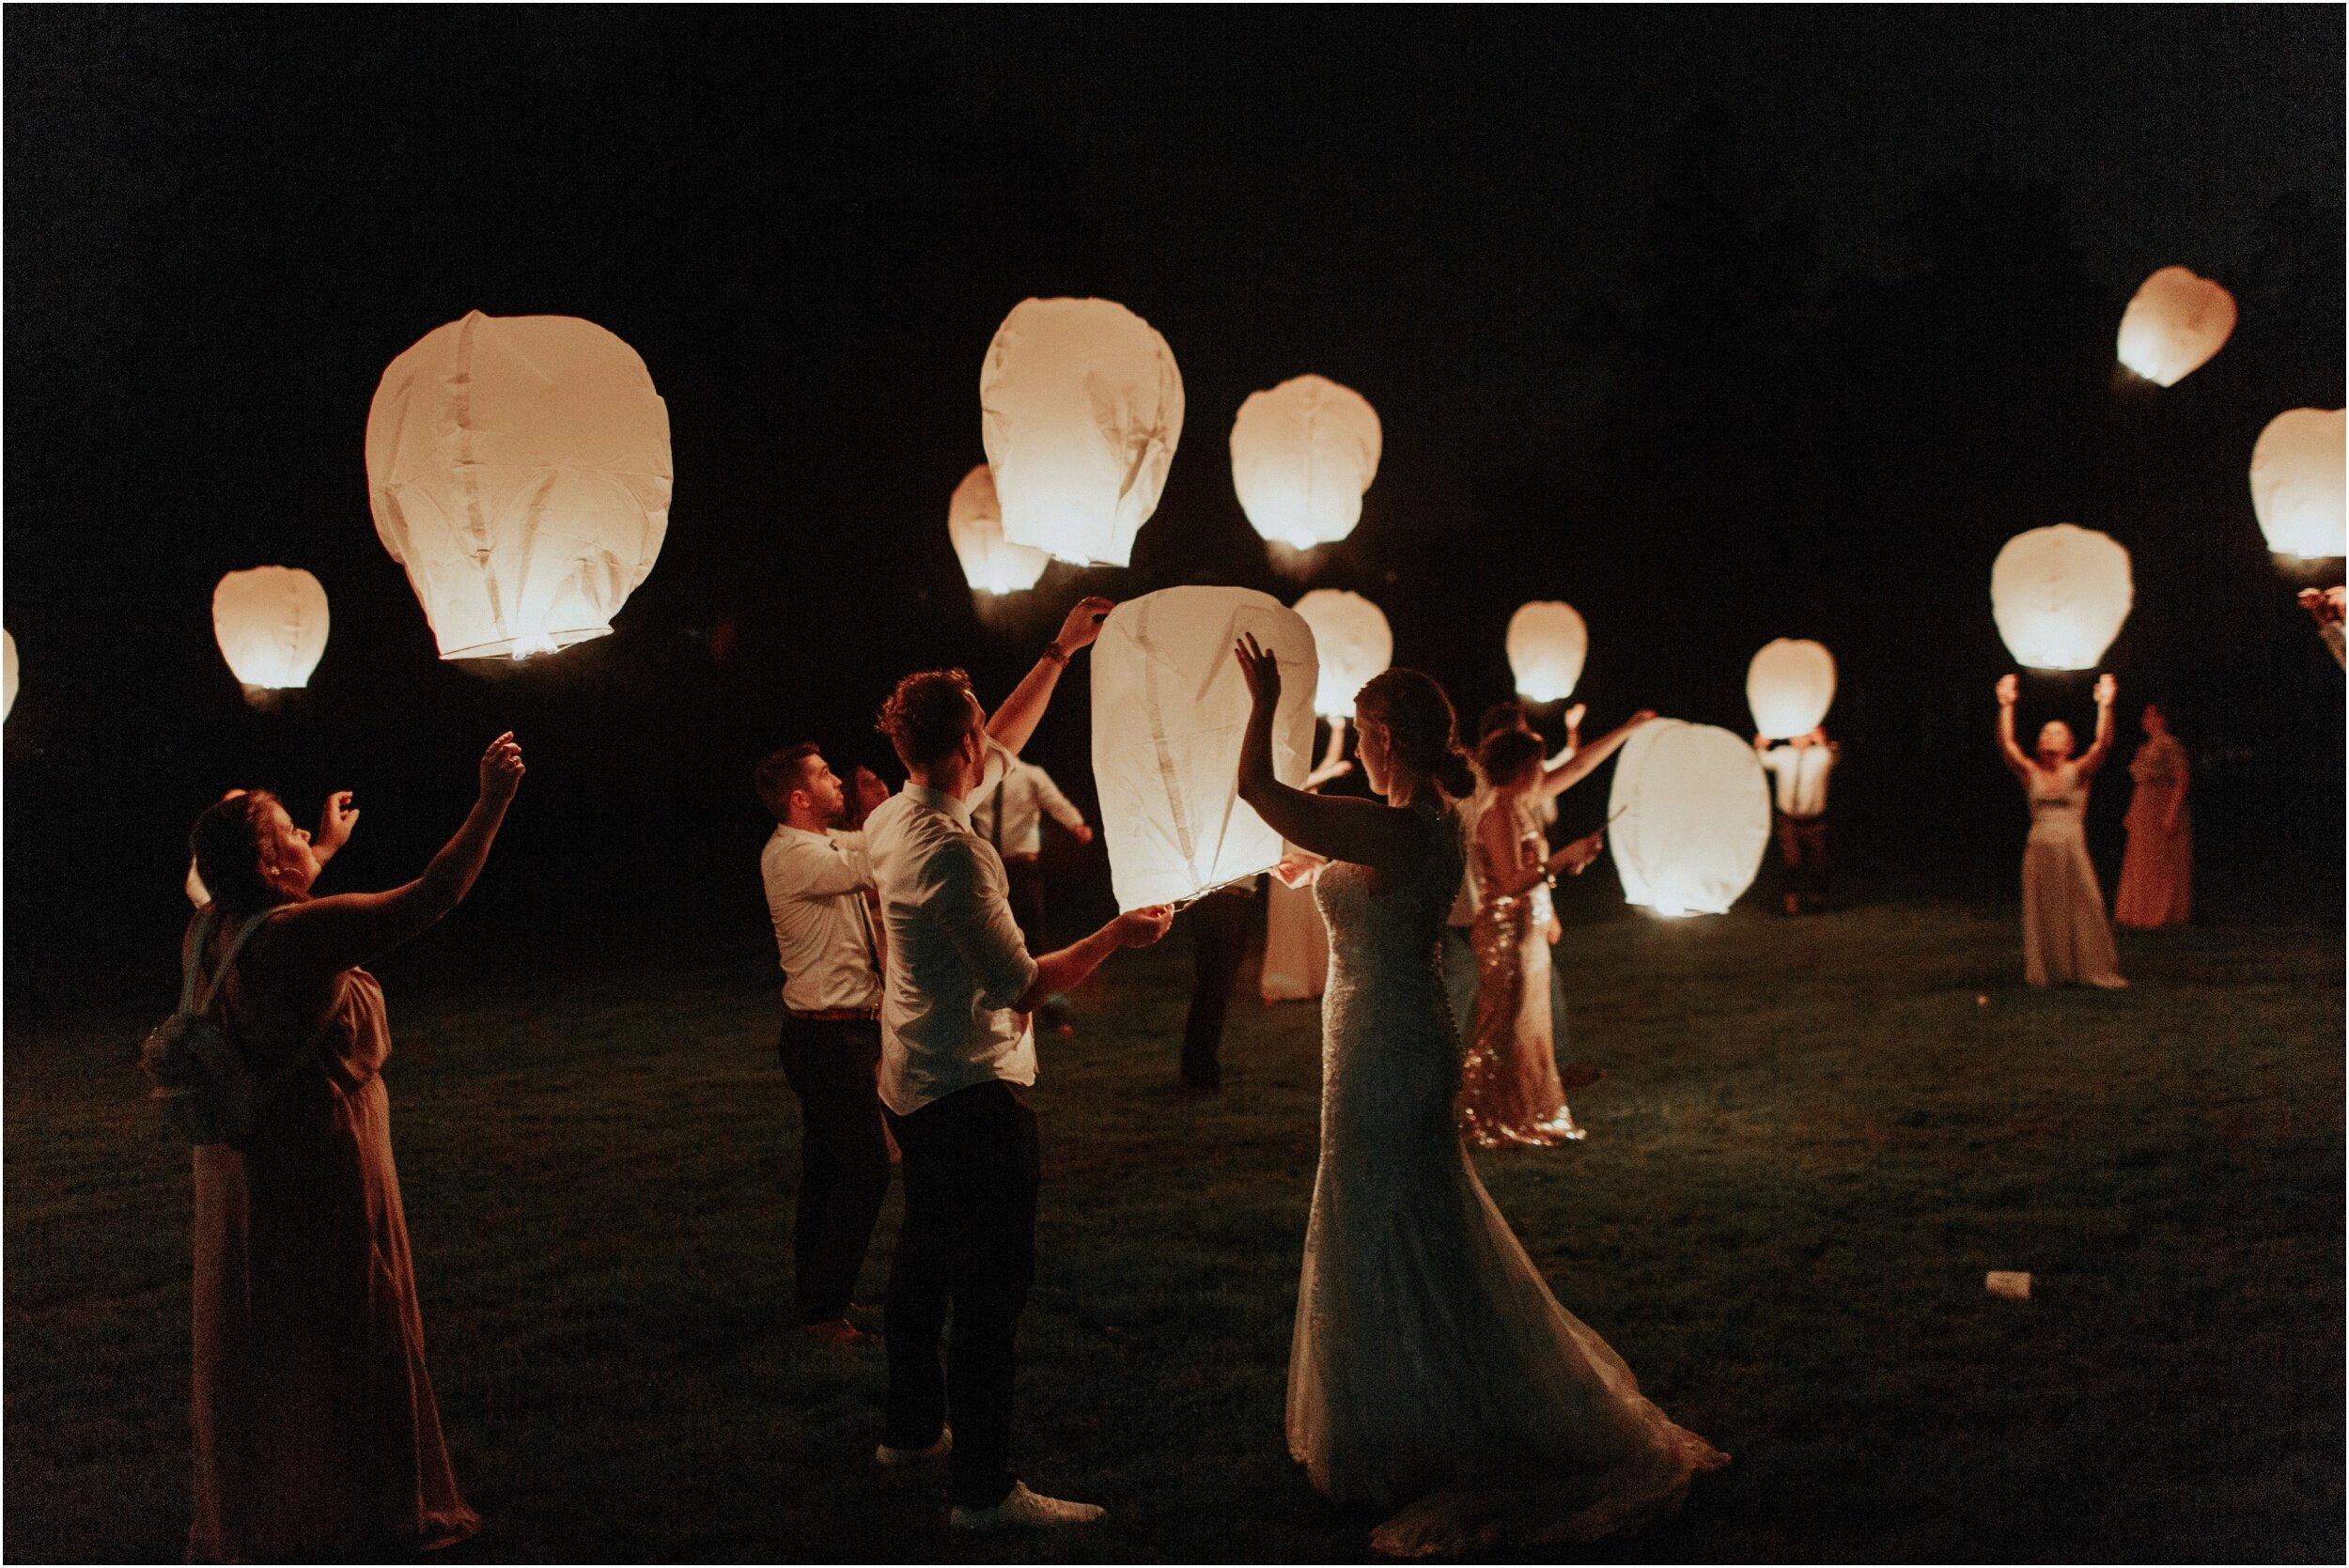 steph-and-jordan-cox-our-wedding-historic-shady-lane-compass-wedding-collective-hazel-lining-photography-destination-elopement-wedding-engagement-photography_0105.jpg